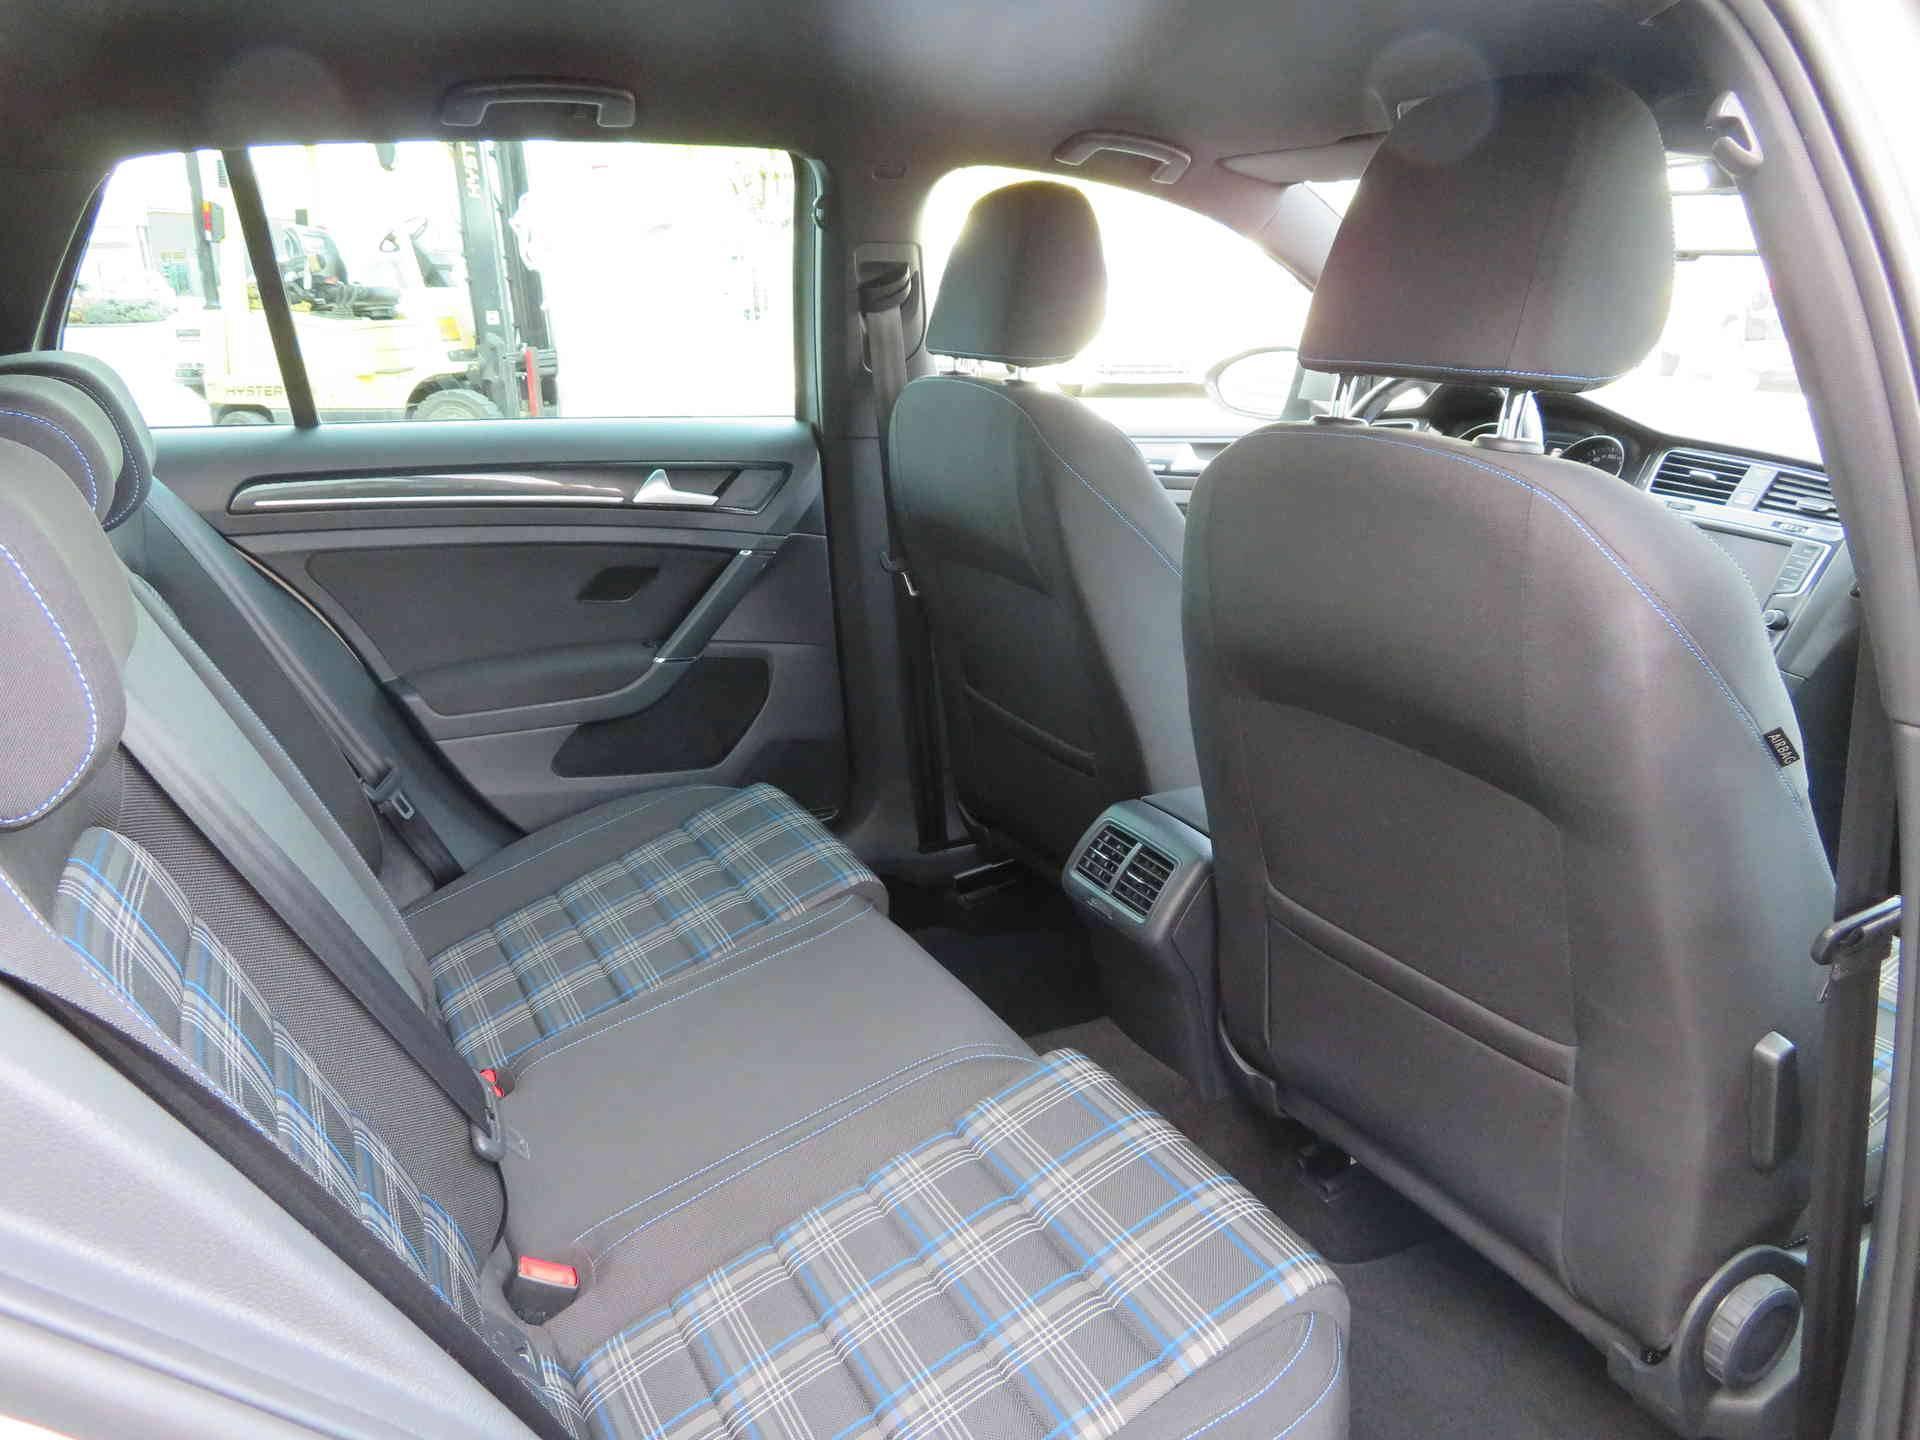 7 - Golf 1.4 TSI 204 Hybride Rechargeable DSG6